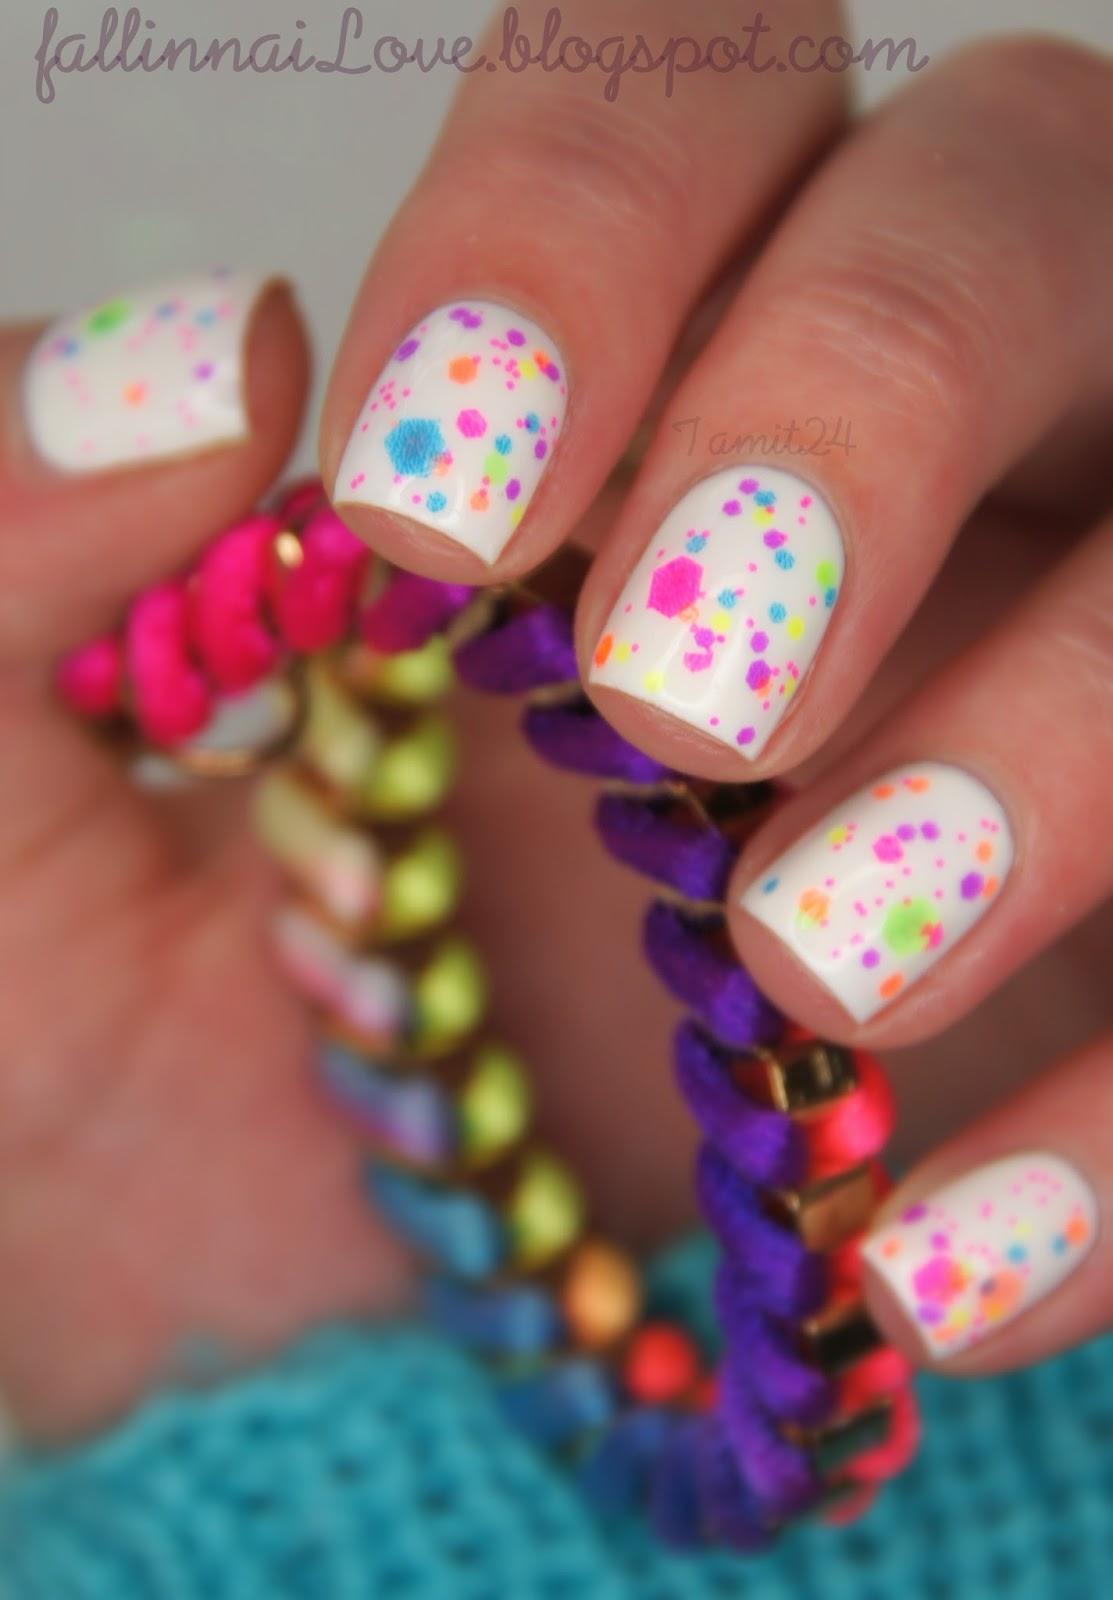 Polish Me Perfect: Fall In ...naiLove!: Lush Lacquer